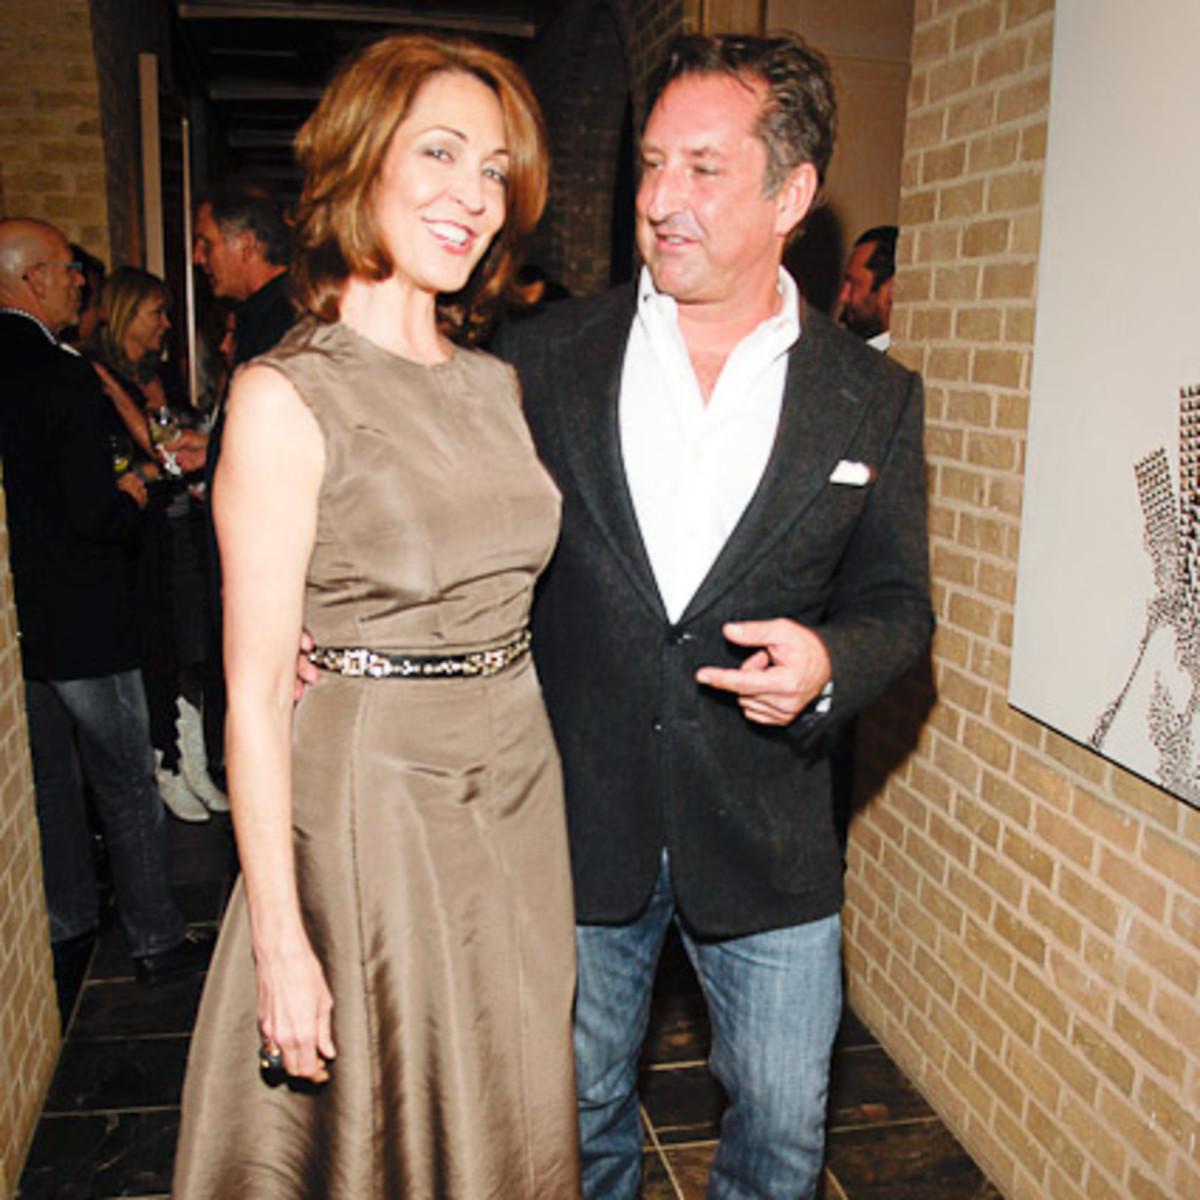 News_Vogue at Becca_Feb. 2010_Elizabeth Arnold_Andrew Echols